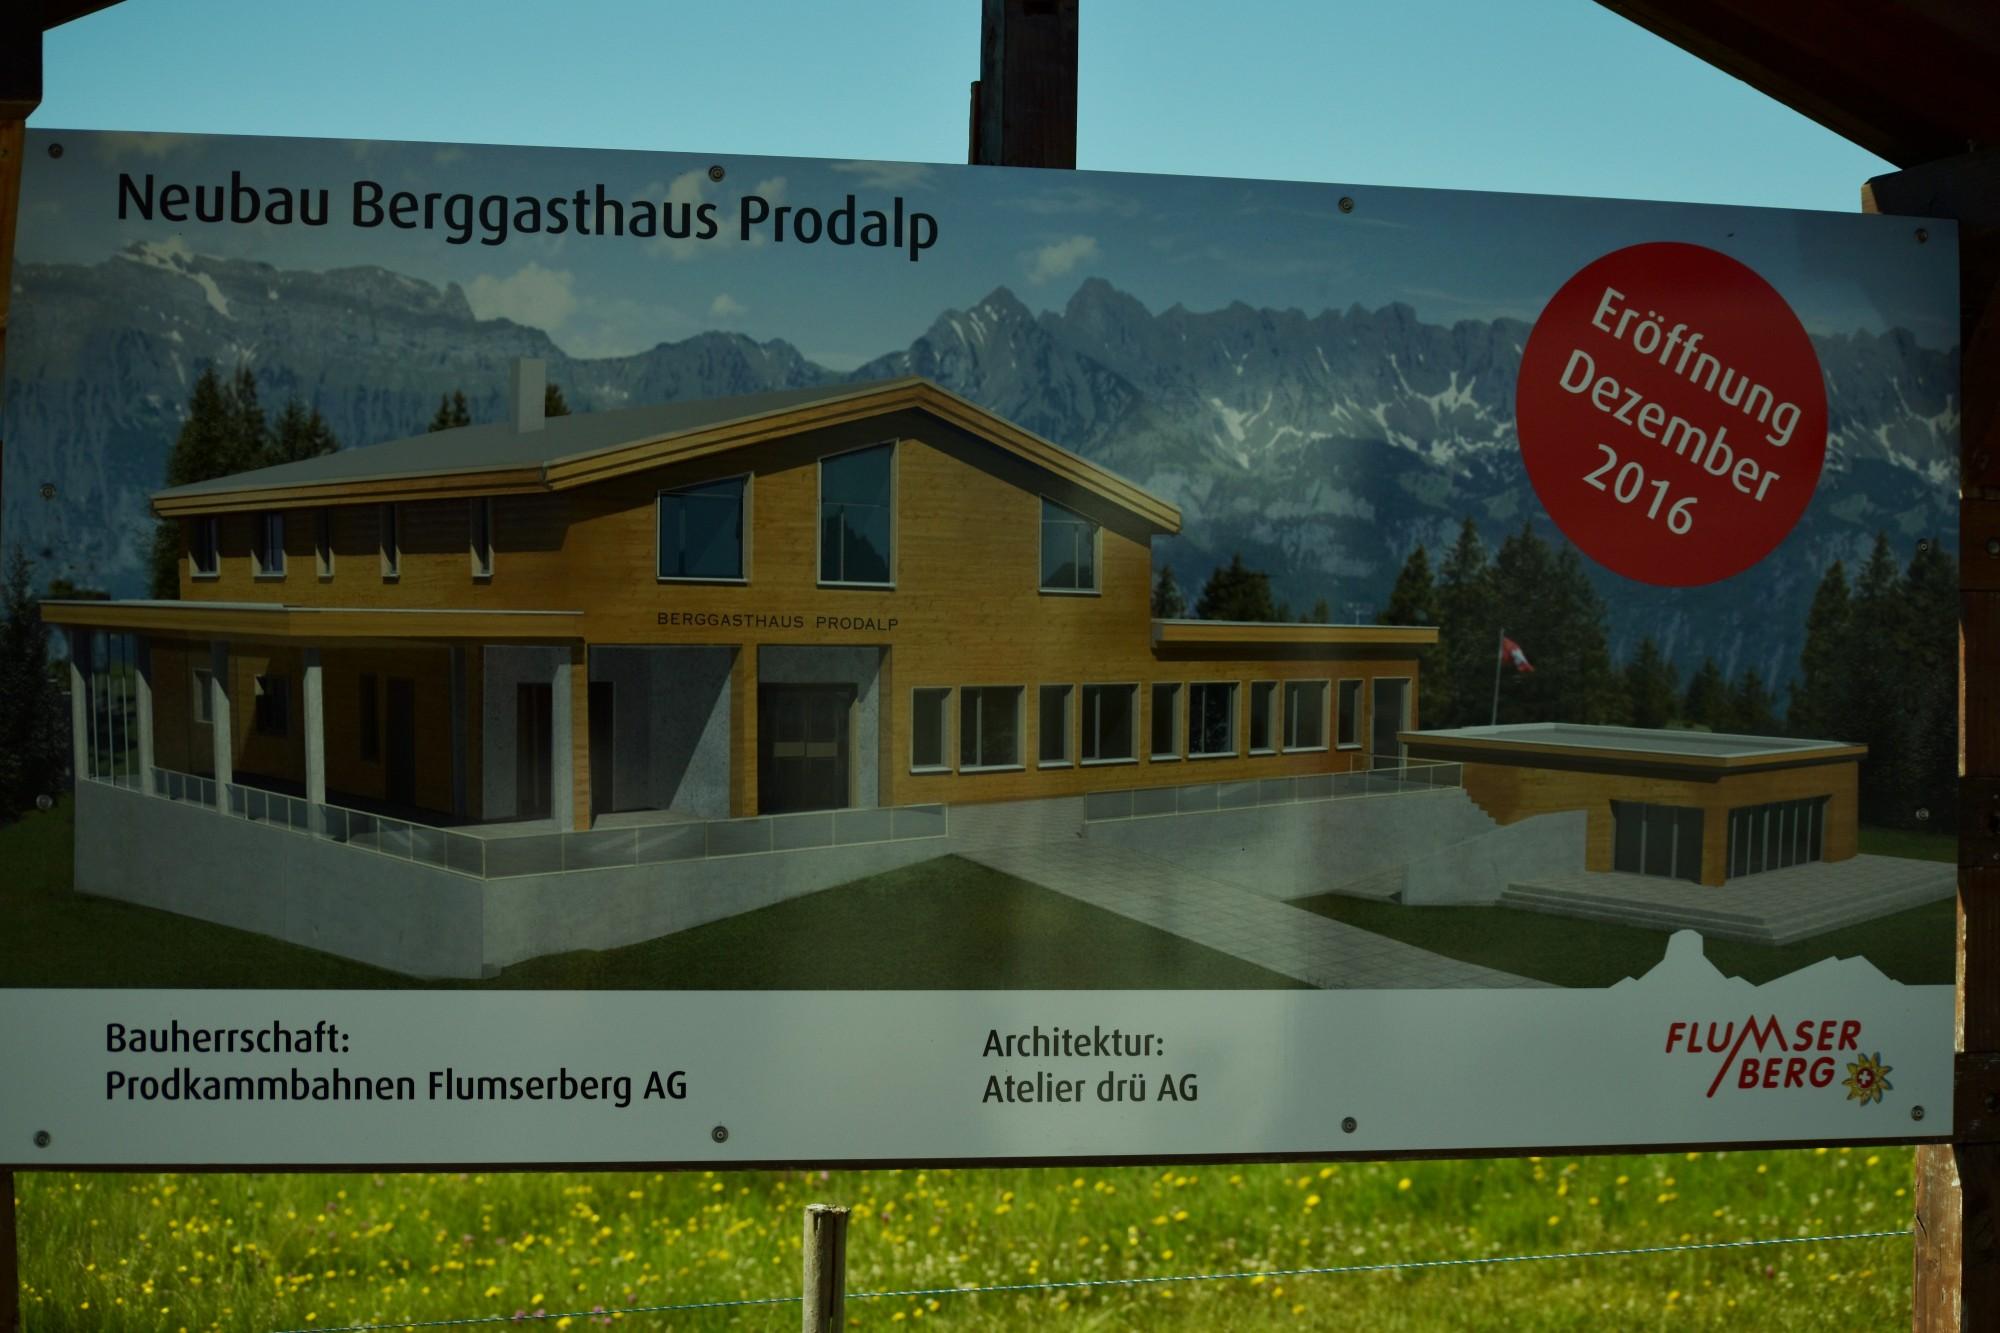 neubau berggasthaus prodalp flumserberg tannenheim j ger holzbau ag. Black Bedroom Furniture Sets. Home Design Ideas